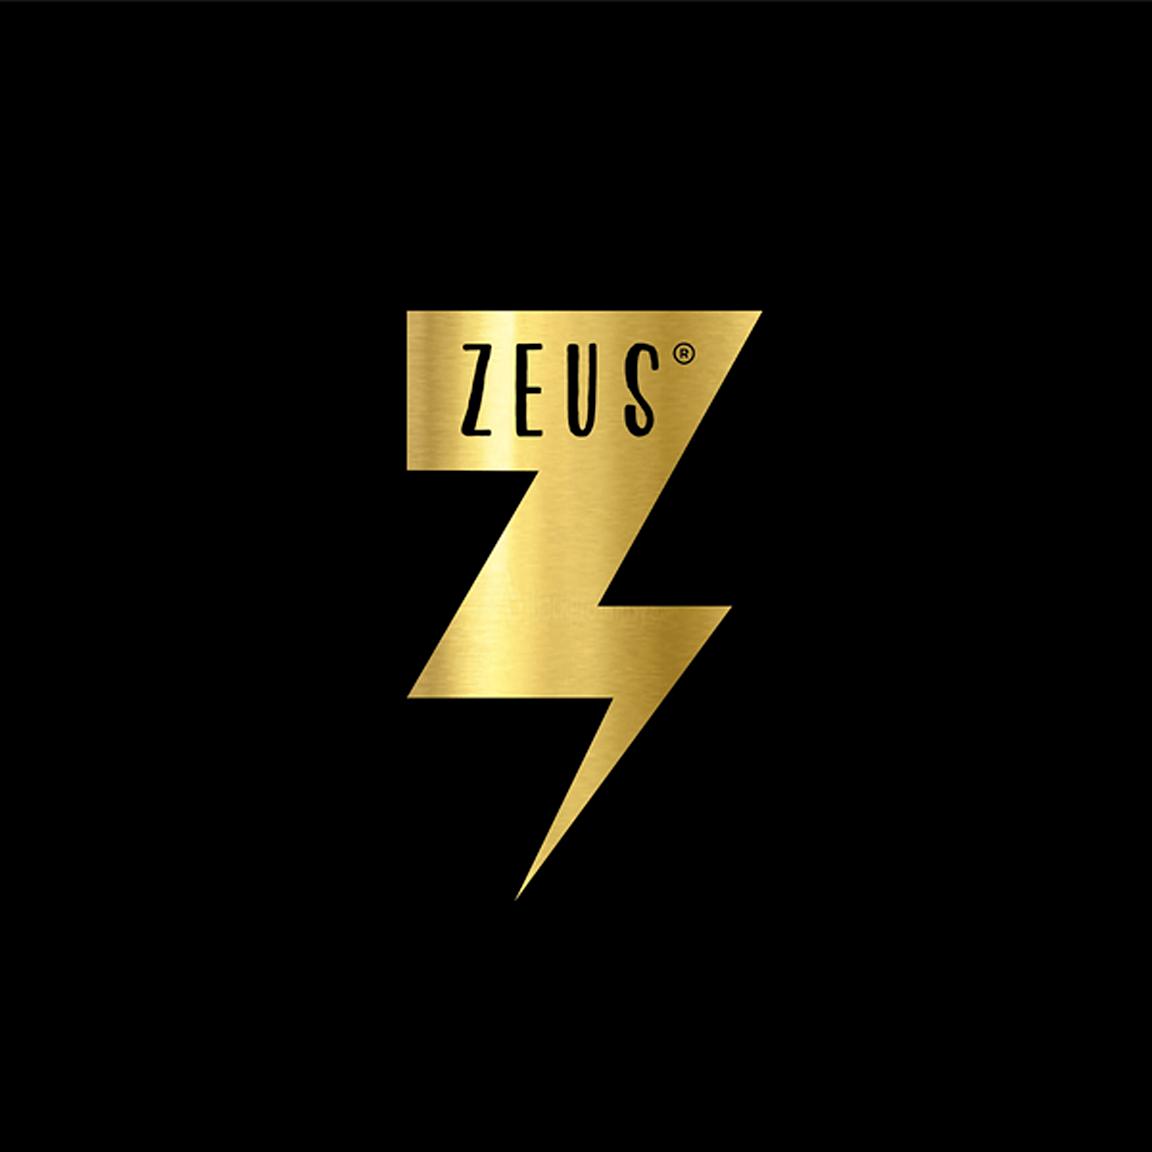 zeus-street-greek-logo